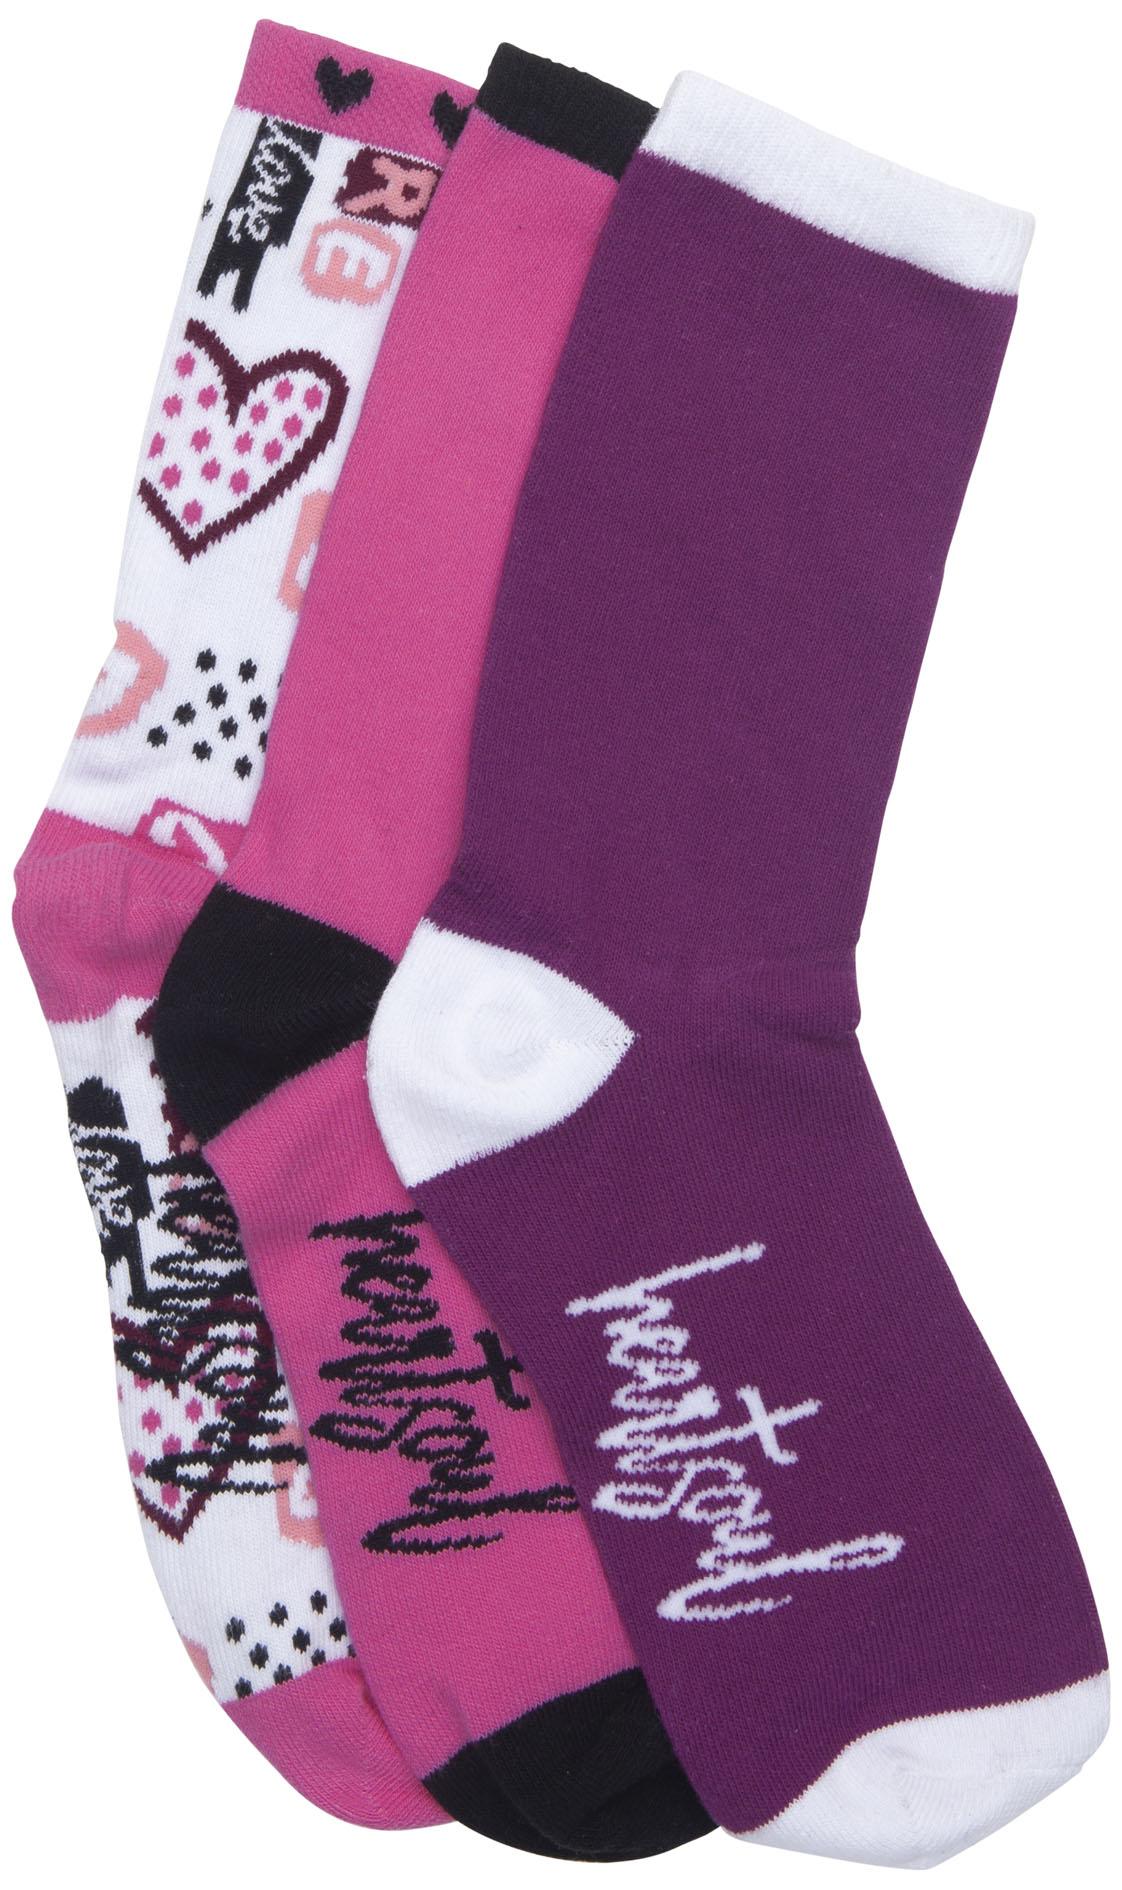 NEW 1-3pr pack of Crew Socks - Love Is Magic-Heartsoul